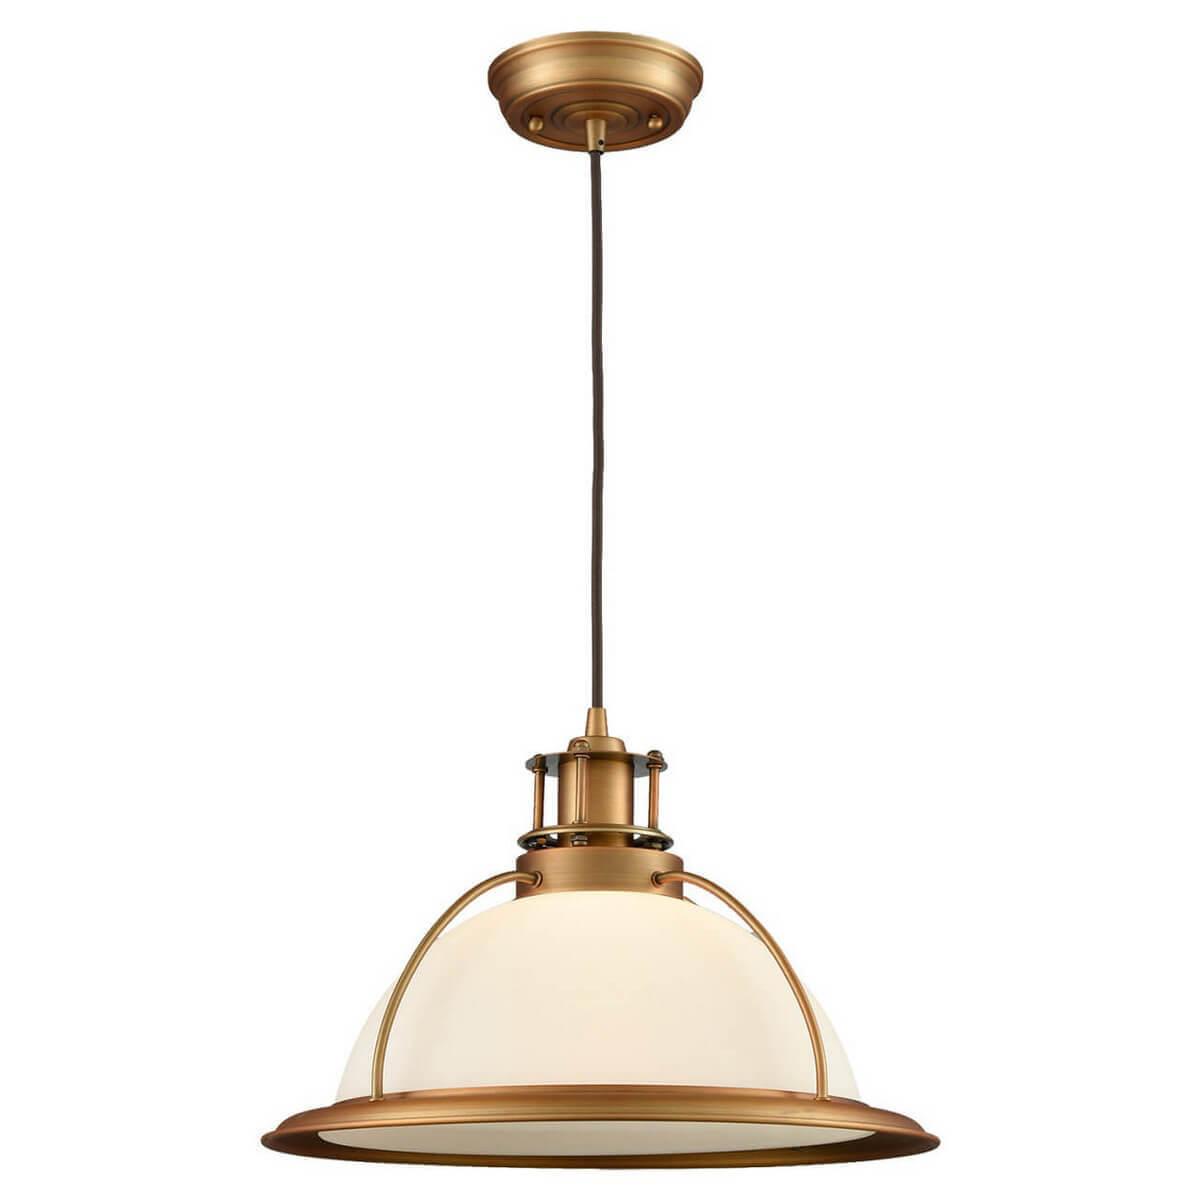 цена на Светильник Lussole LOFT LSP-9811 LSP-9811